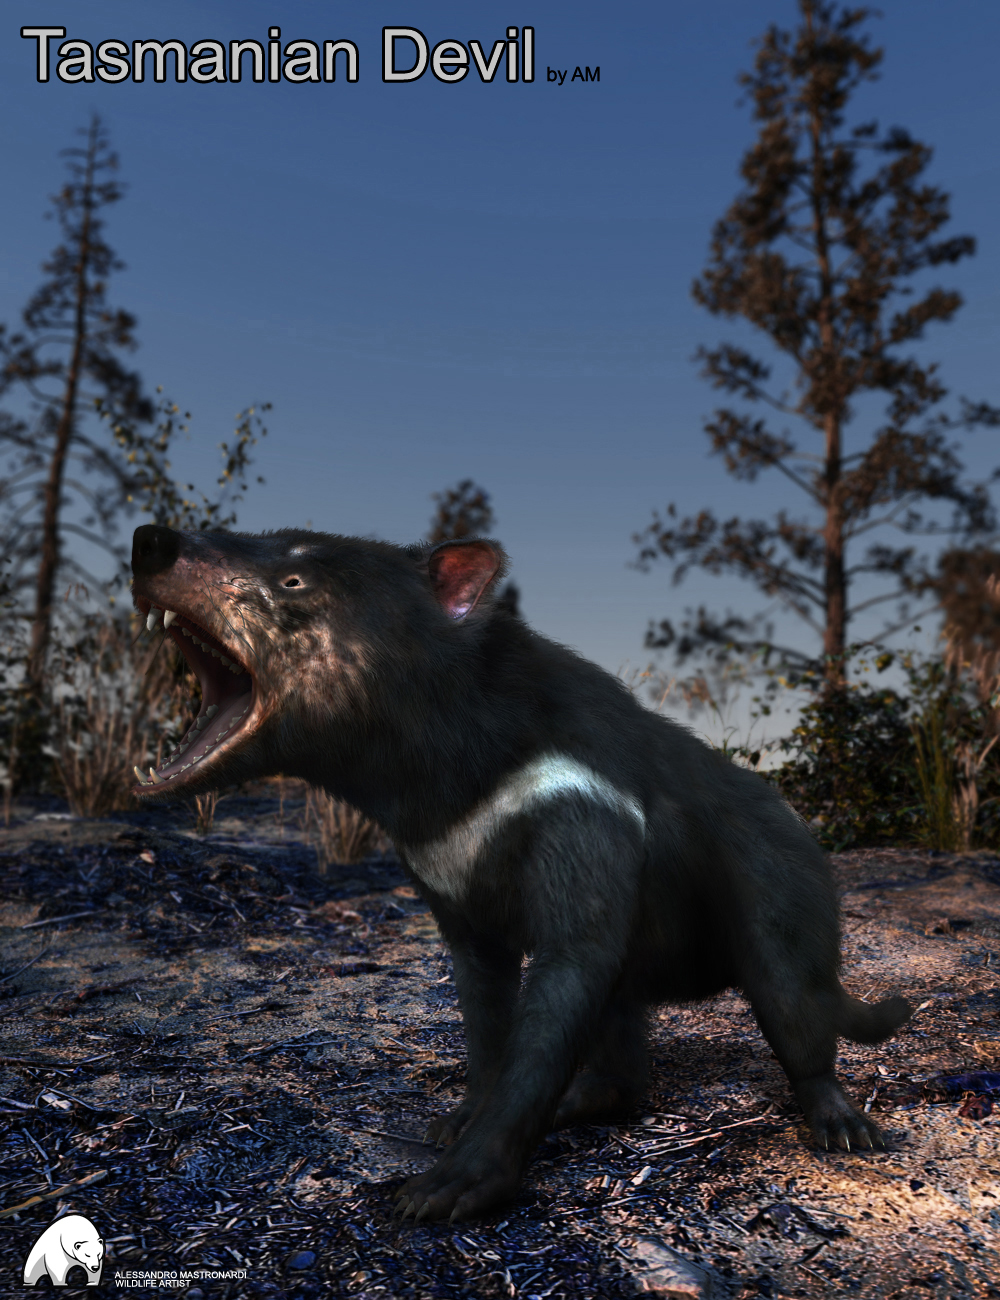 Tasmanian Devil by AM by: Alessandro_AM, 3D Models by Daz 3D